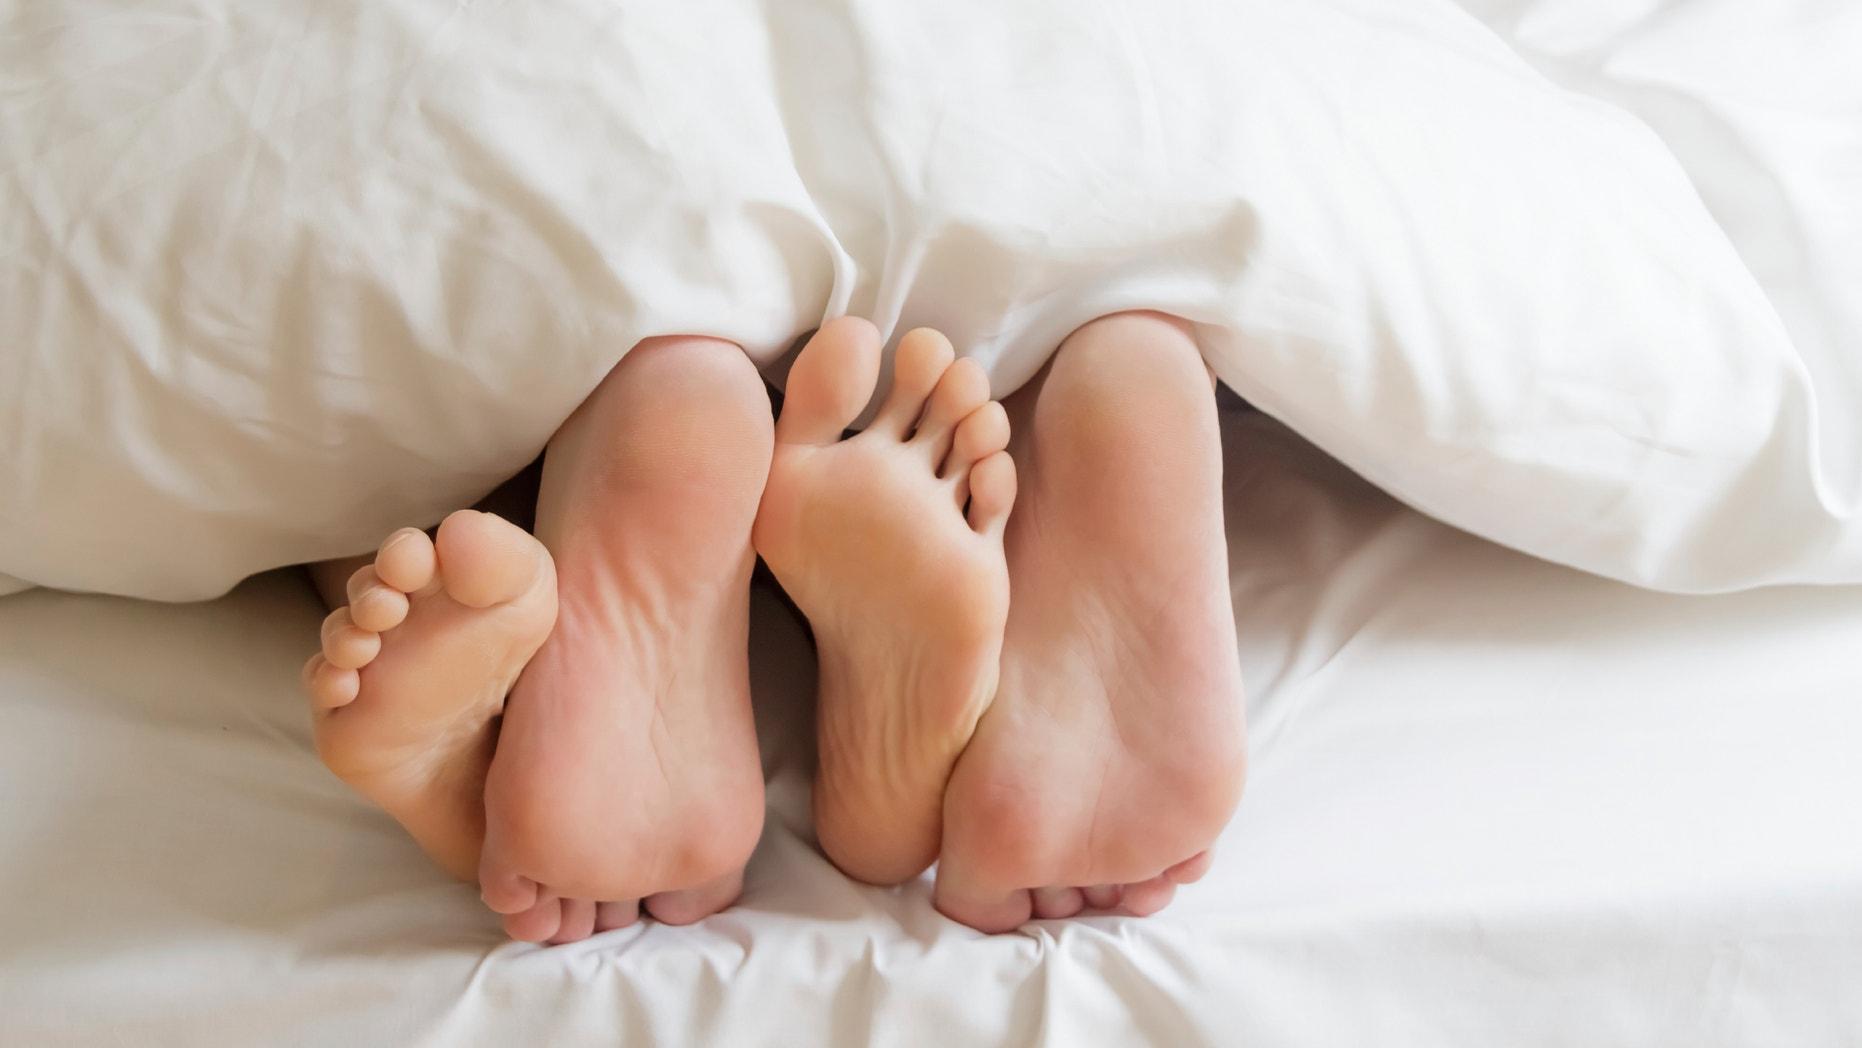 No limb wpman having sex